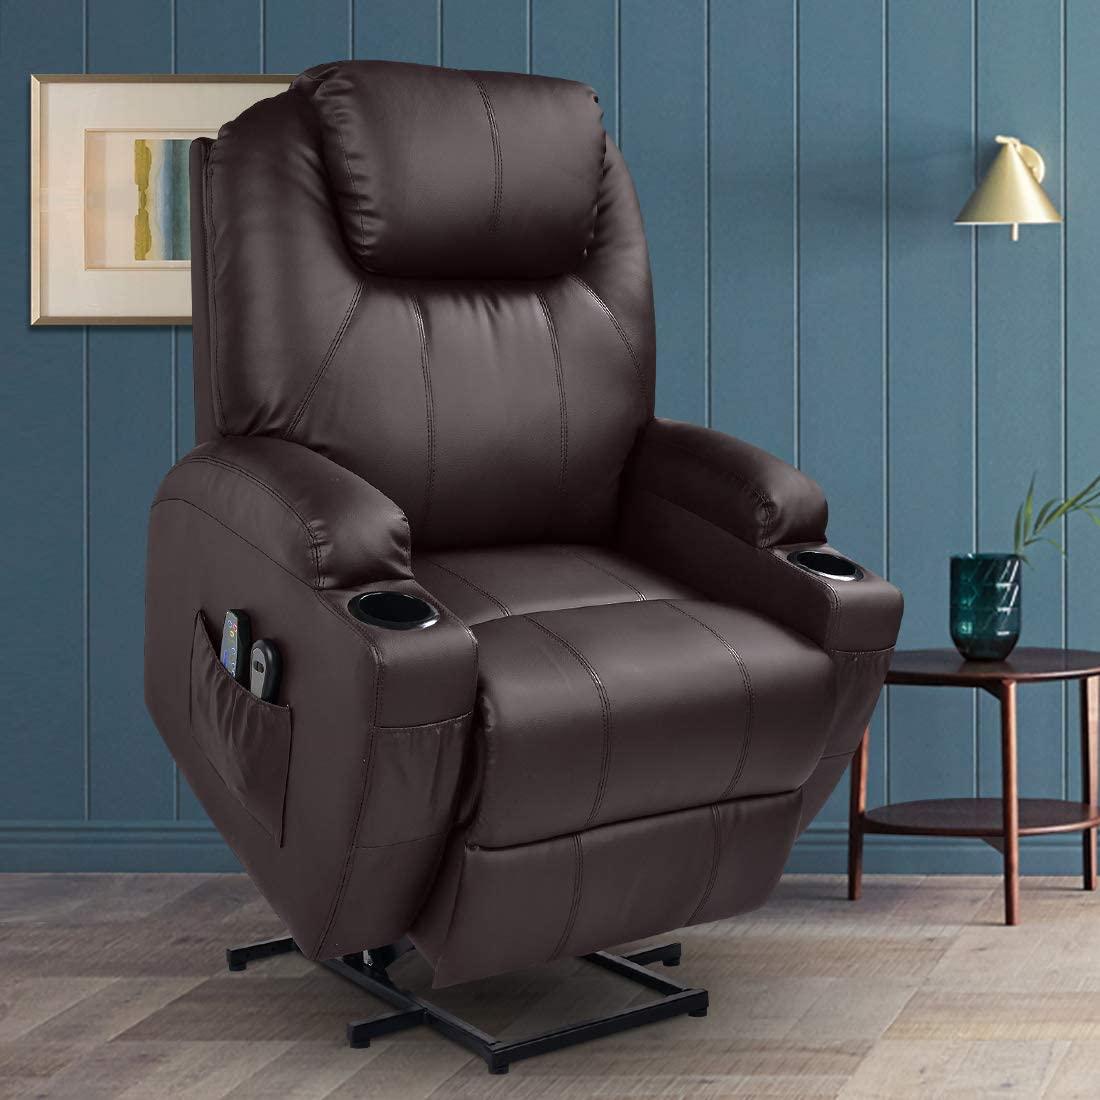 1. MAGIC UNION Power Lift Massage Recliner Chair